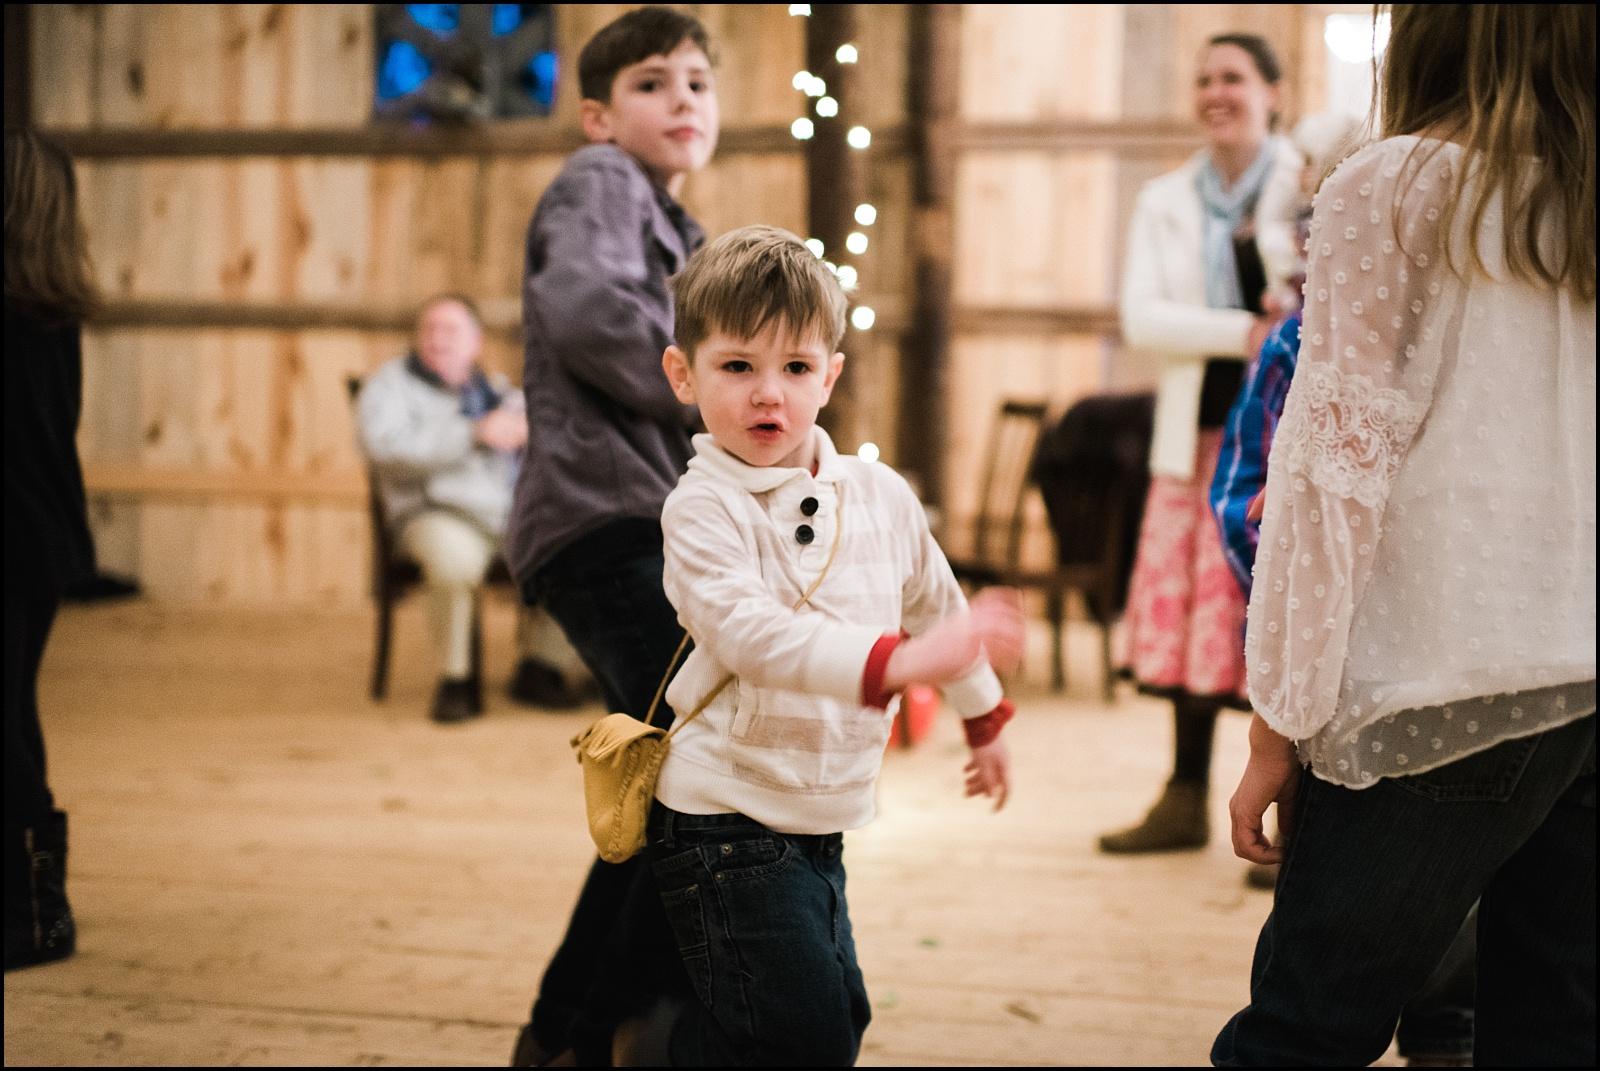 Boy on ceremony dance floor